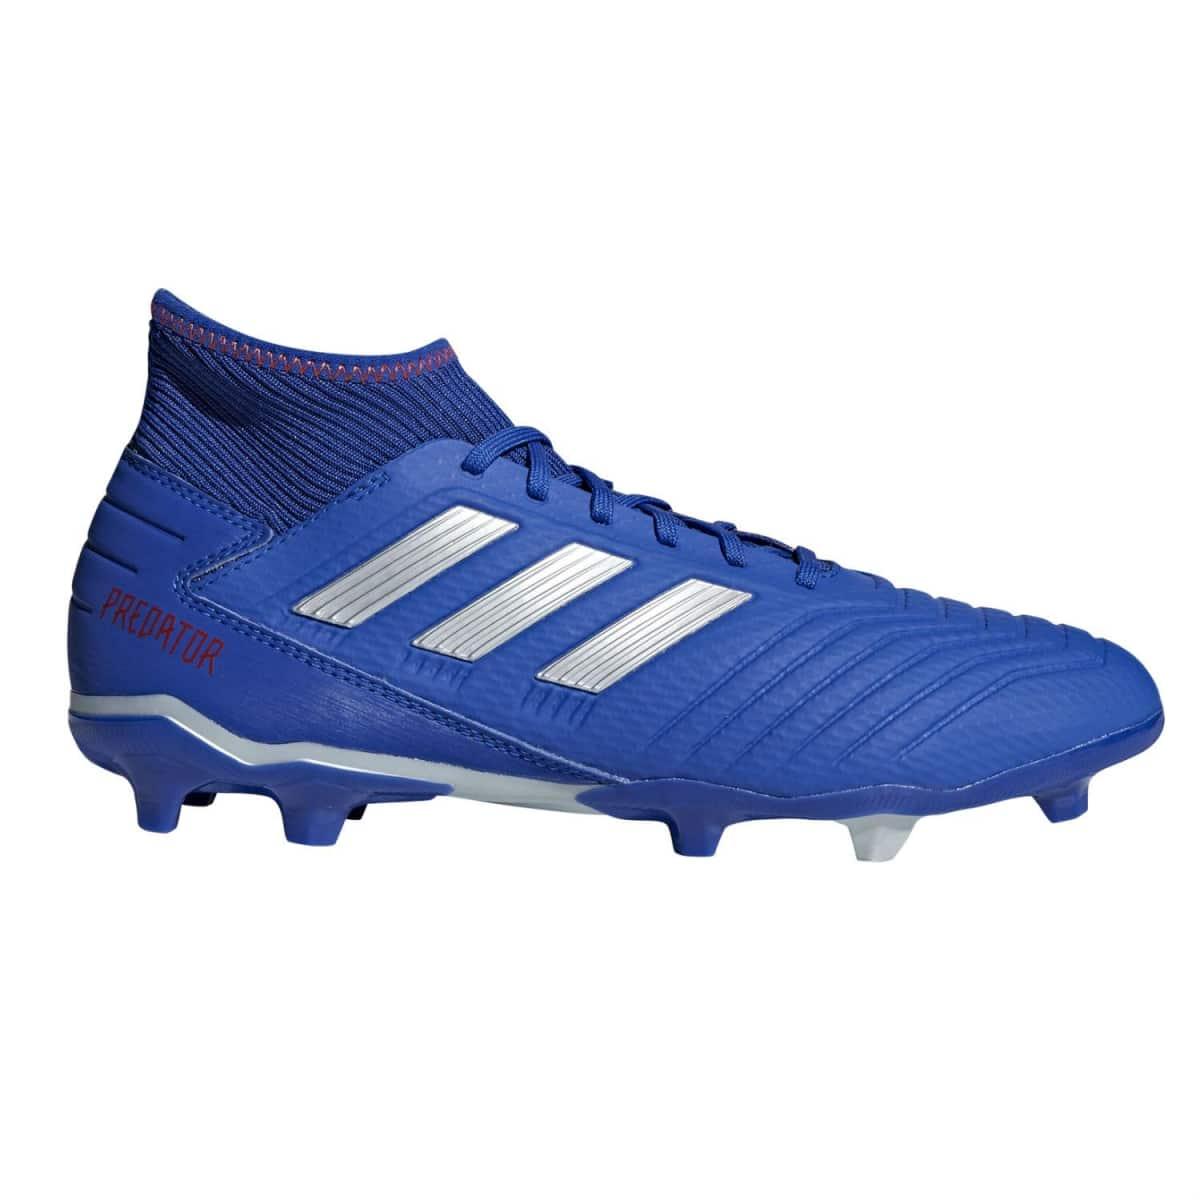 adidas Predator 19.3 FG Soccer Boots 3443ac29dead0